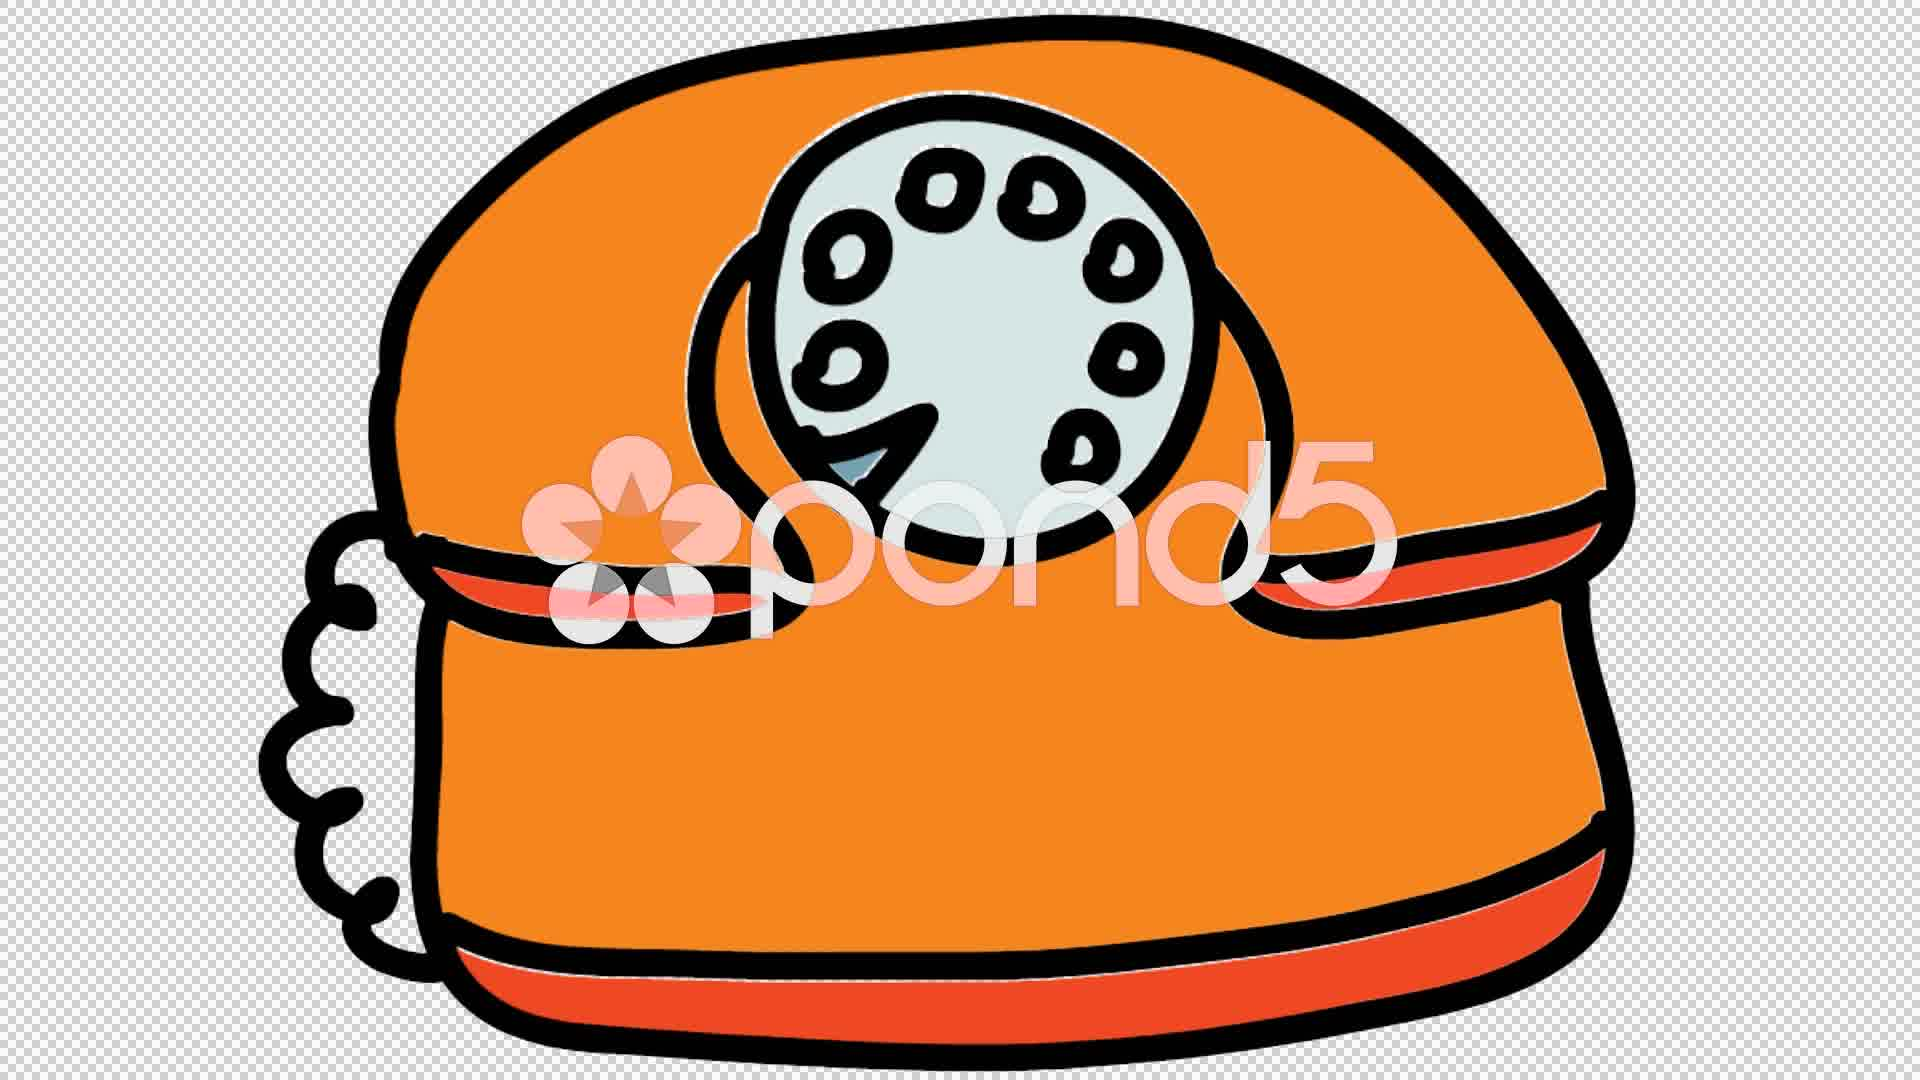 1920x1080 Old Telephone Cartoon Line Drawing Illustration Animation